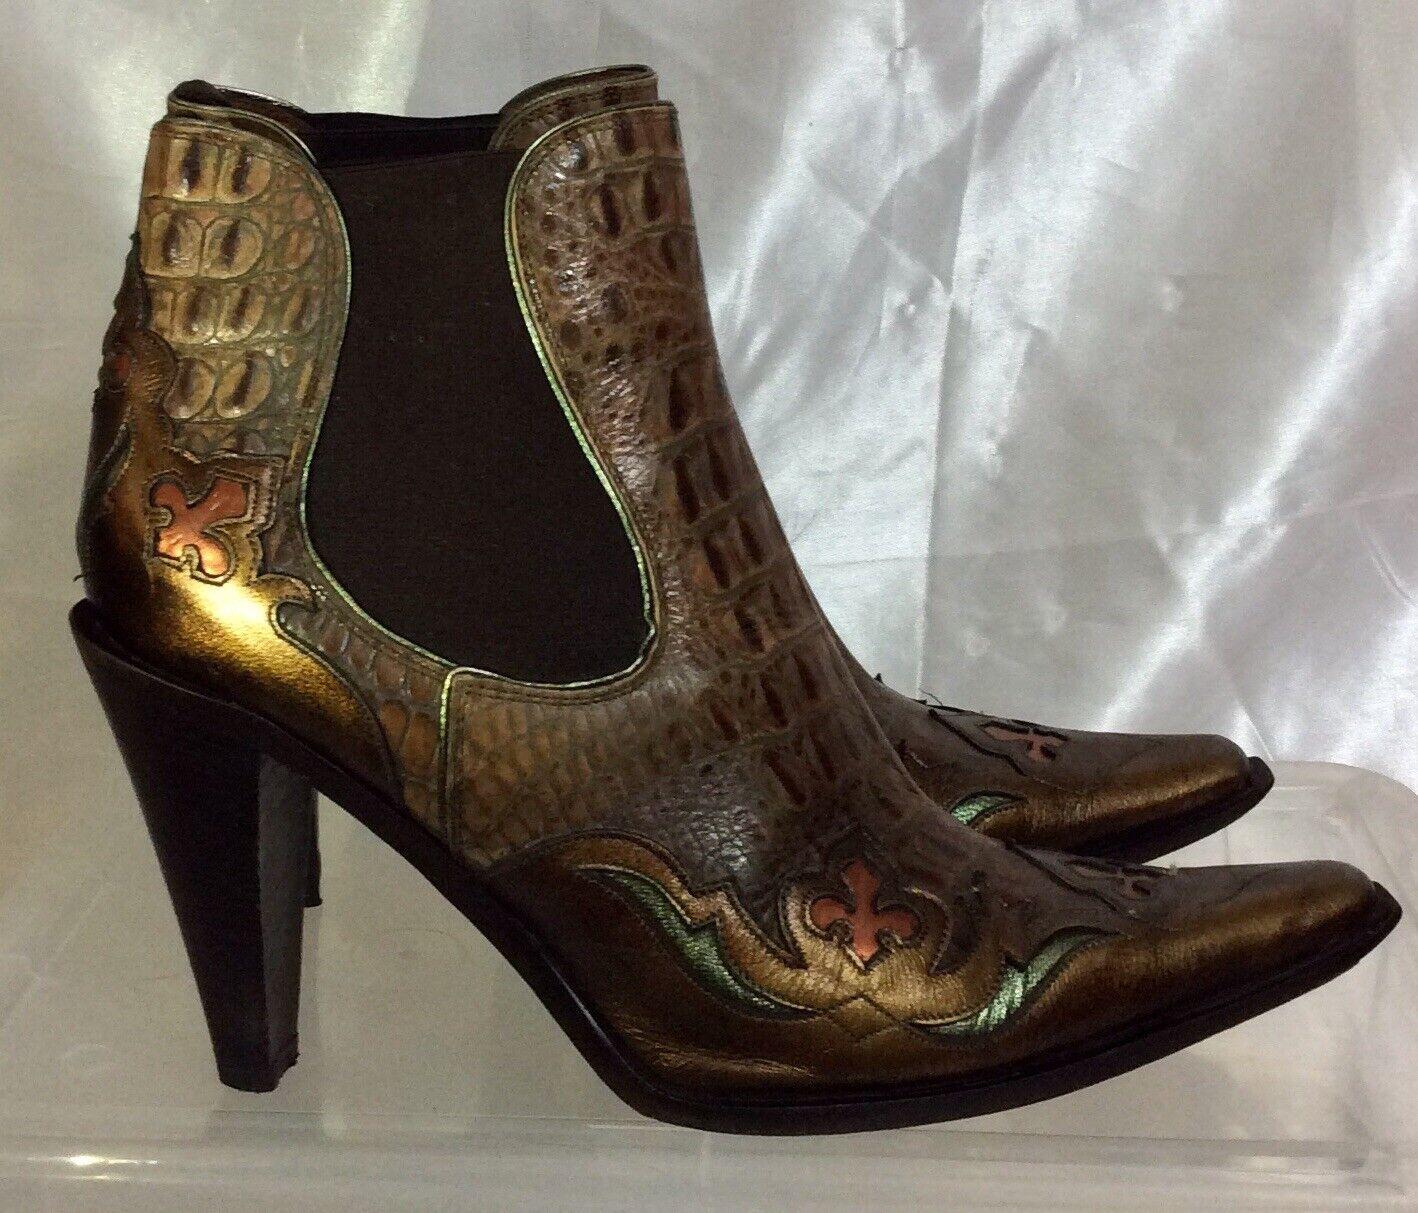 Donald J Pliner Western Couture VISIT Croc Print Leather Ankle Boots Women's 7.5